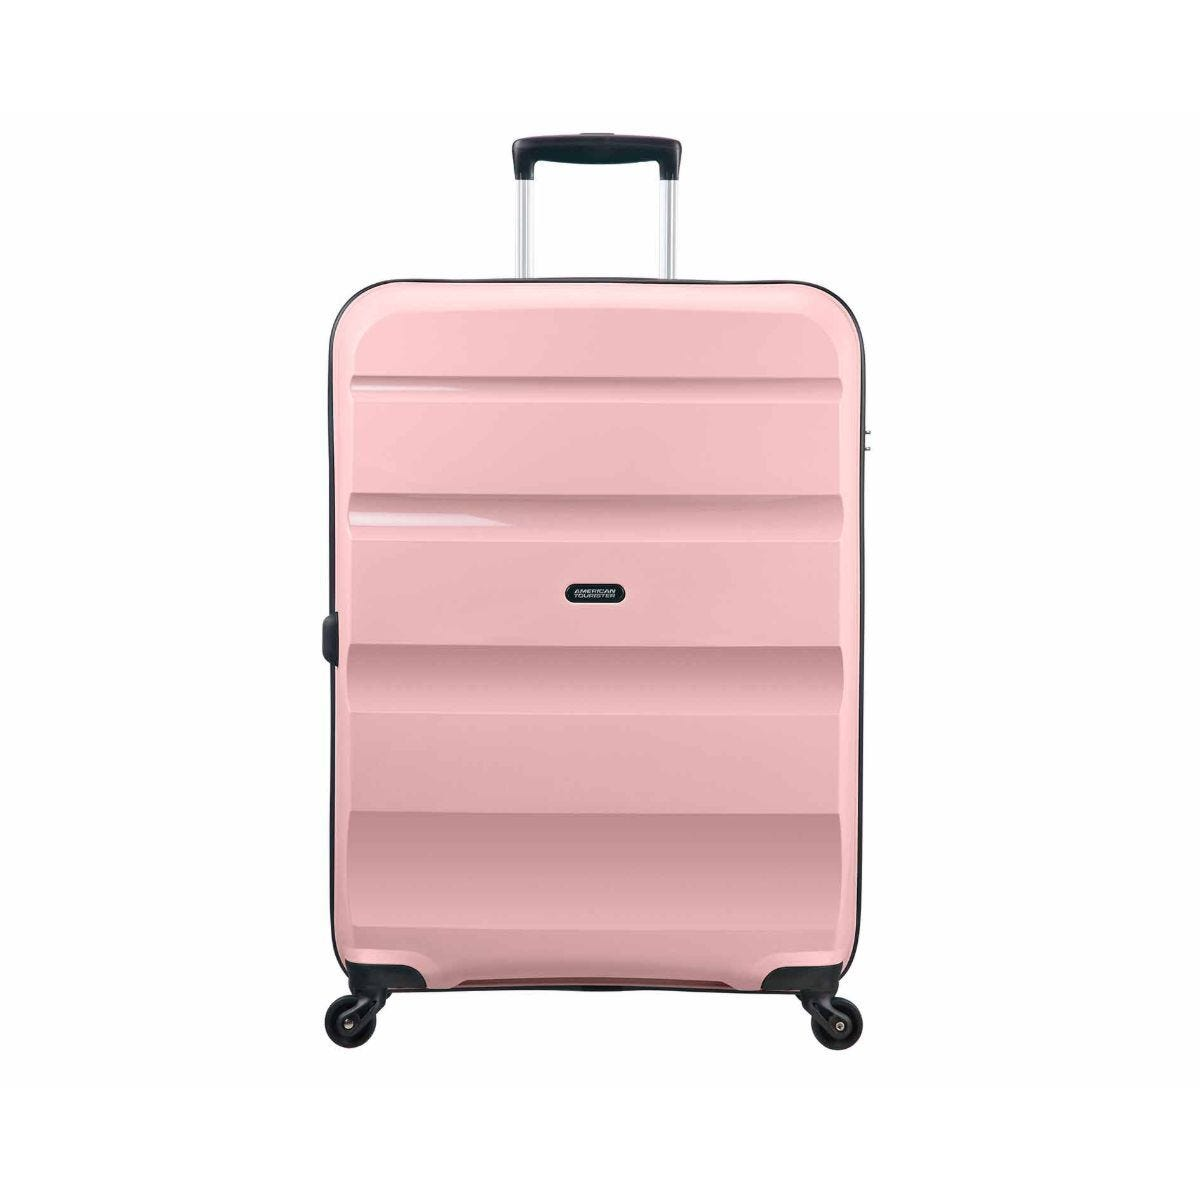 American Tourister Bon Air Cabin Suitcase Cherry Blossoms